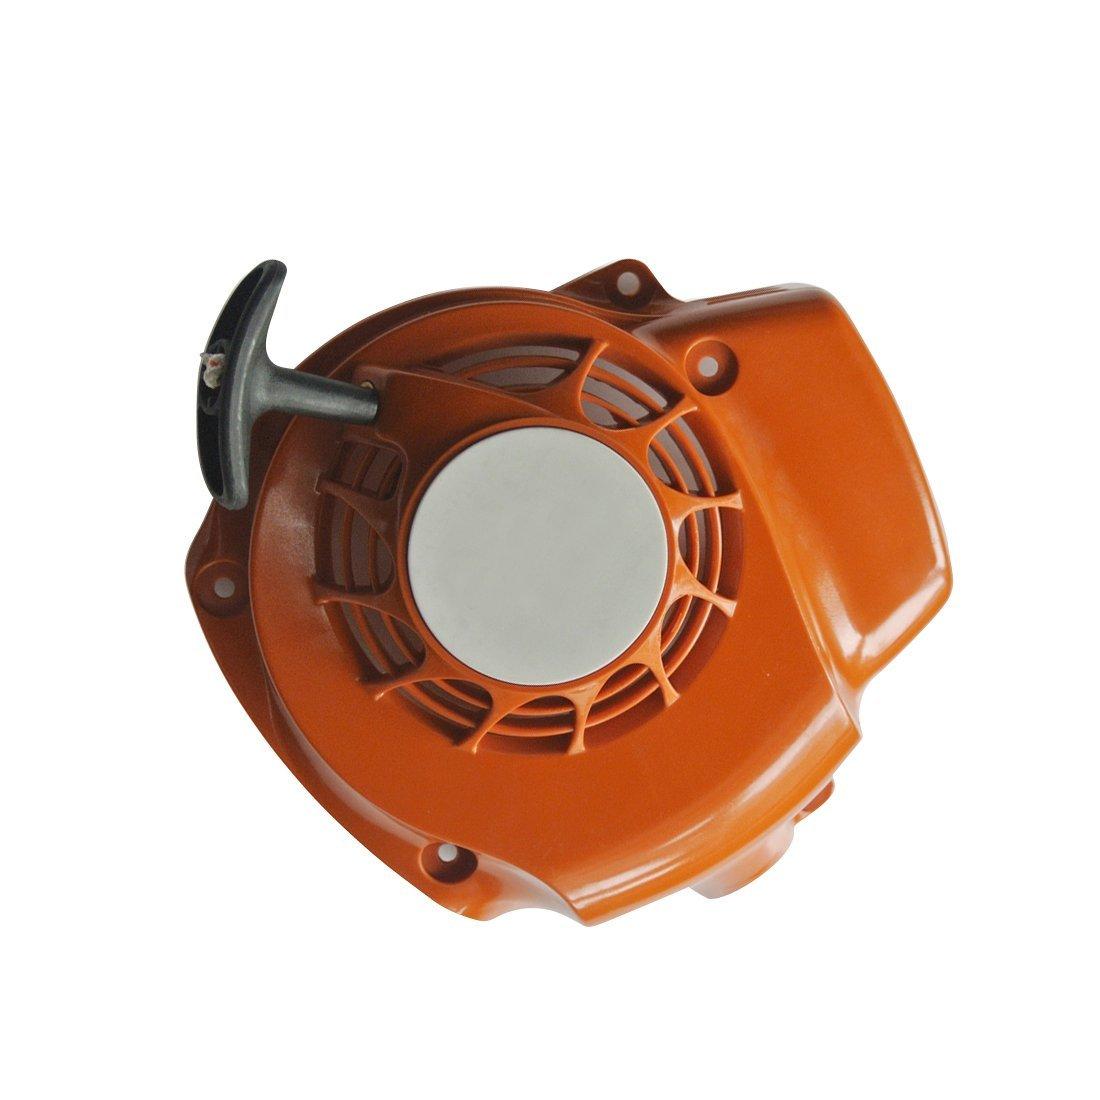 JRL Rewind Recoil Pull Start Starter Fit STIHL HS81 HS81T 81R HS86 86T HS86R Trimmer Huang Machinery